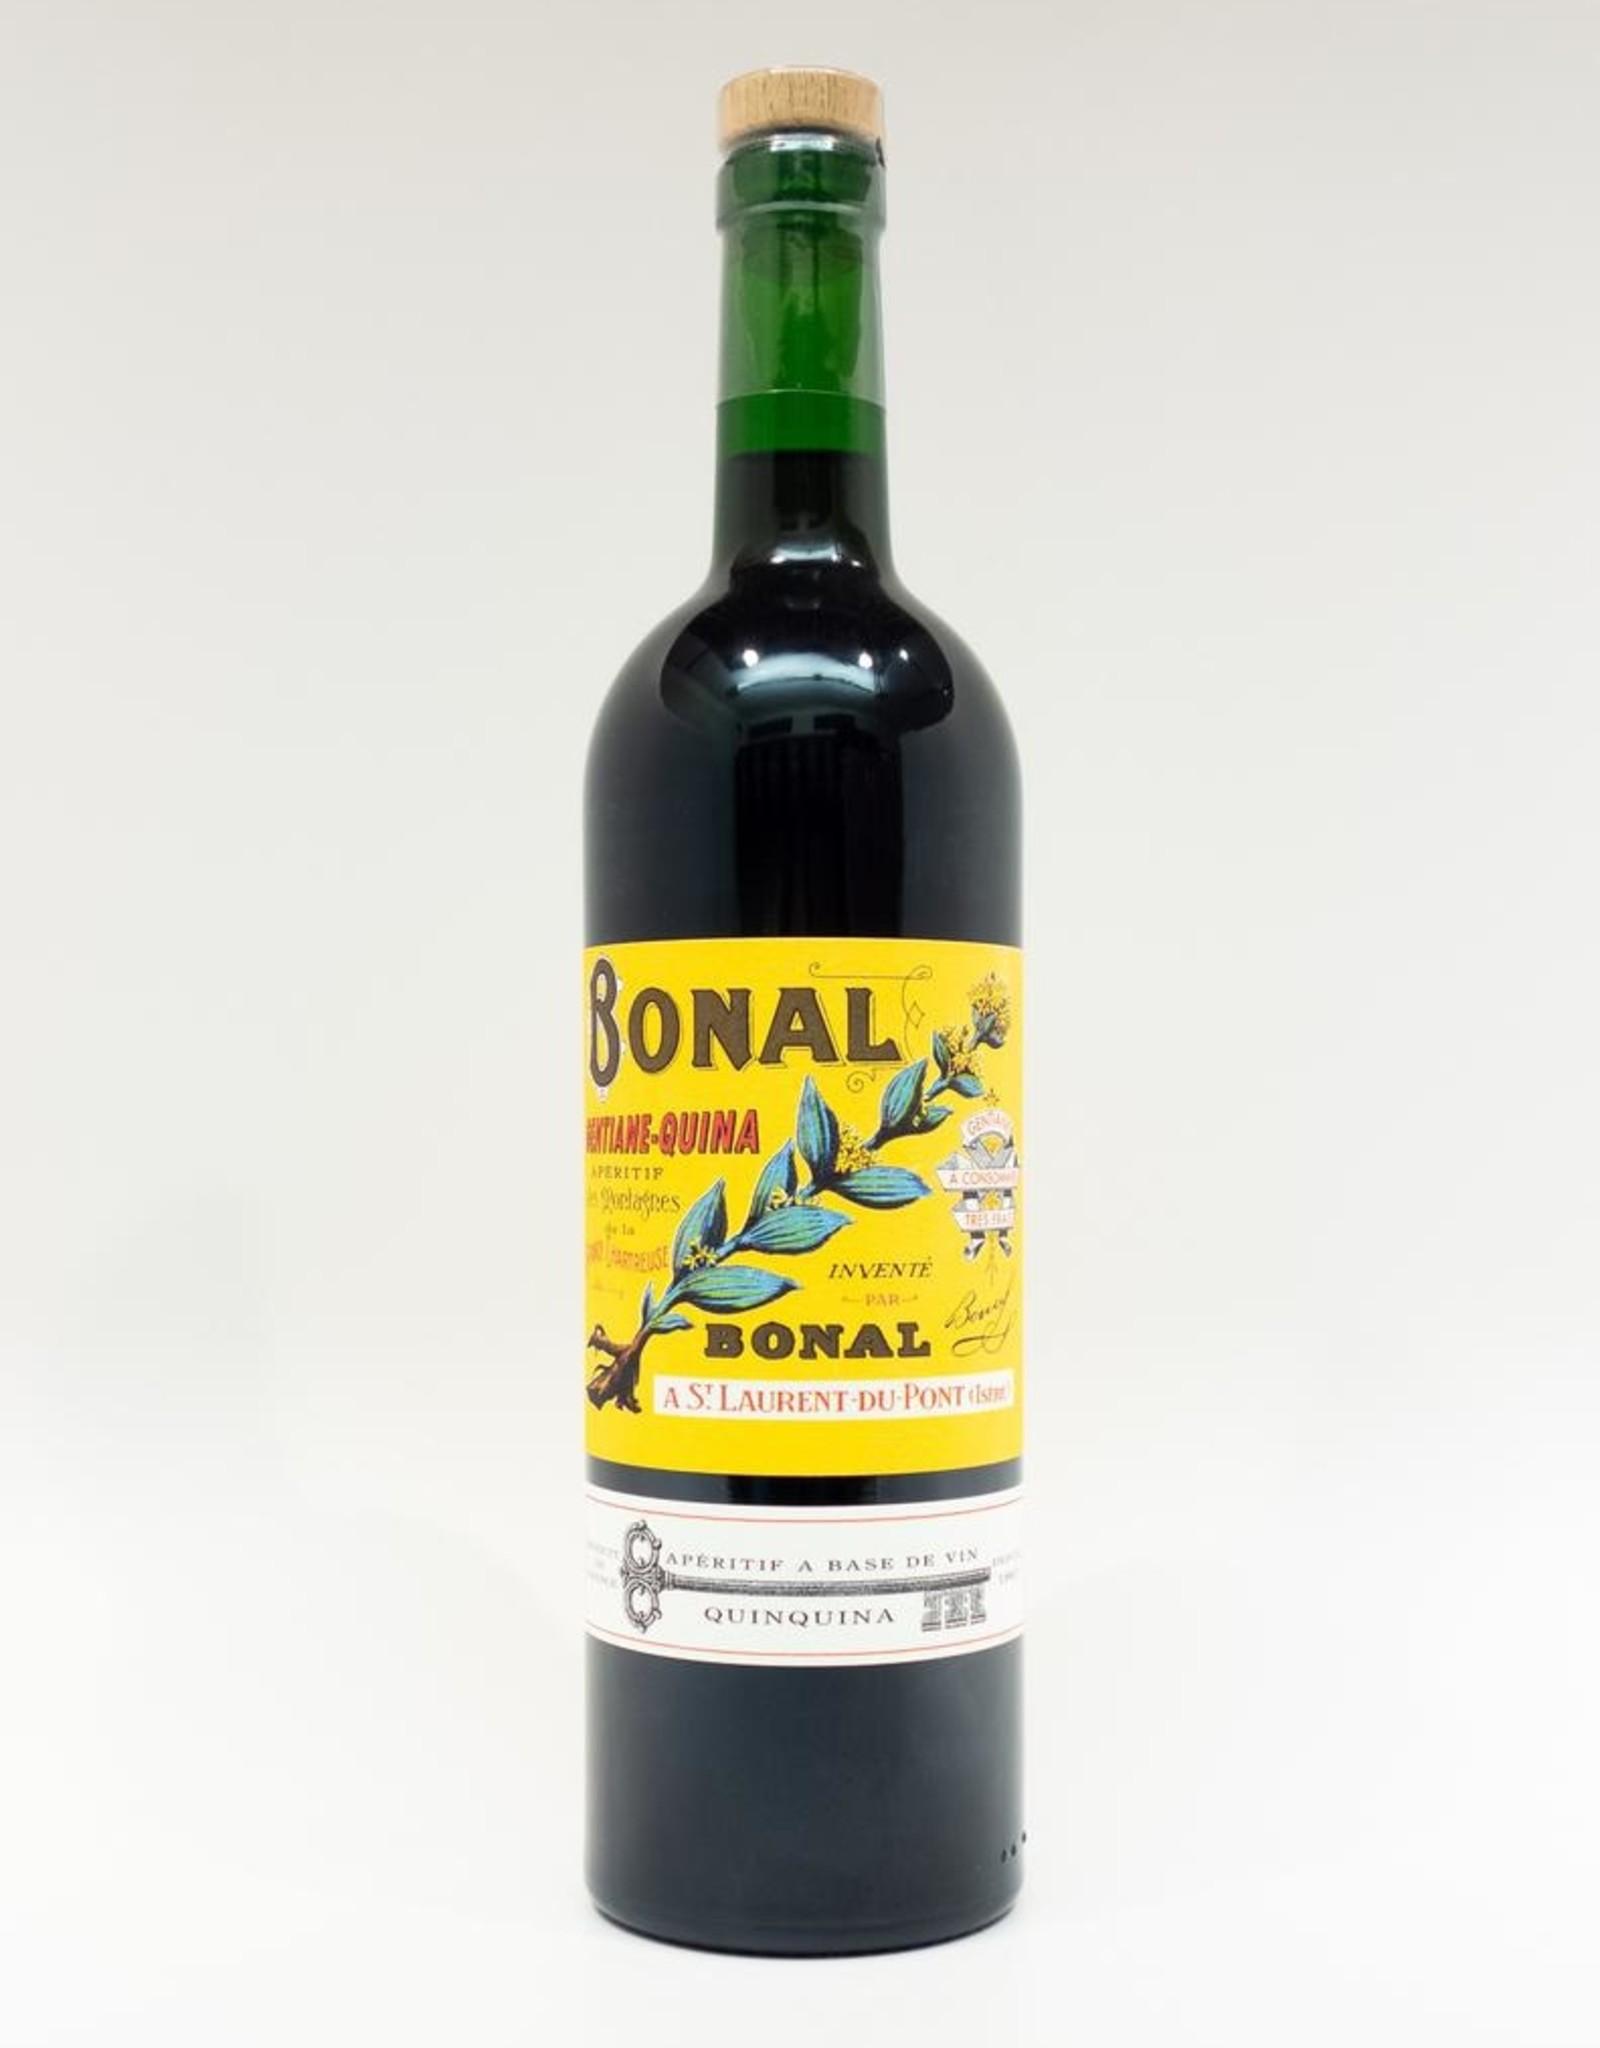 Wine-Aromatized-Quinquina/Chinato Bonal Bitter Aperitif 750ml